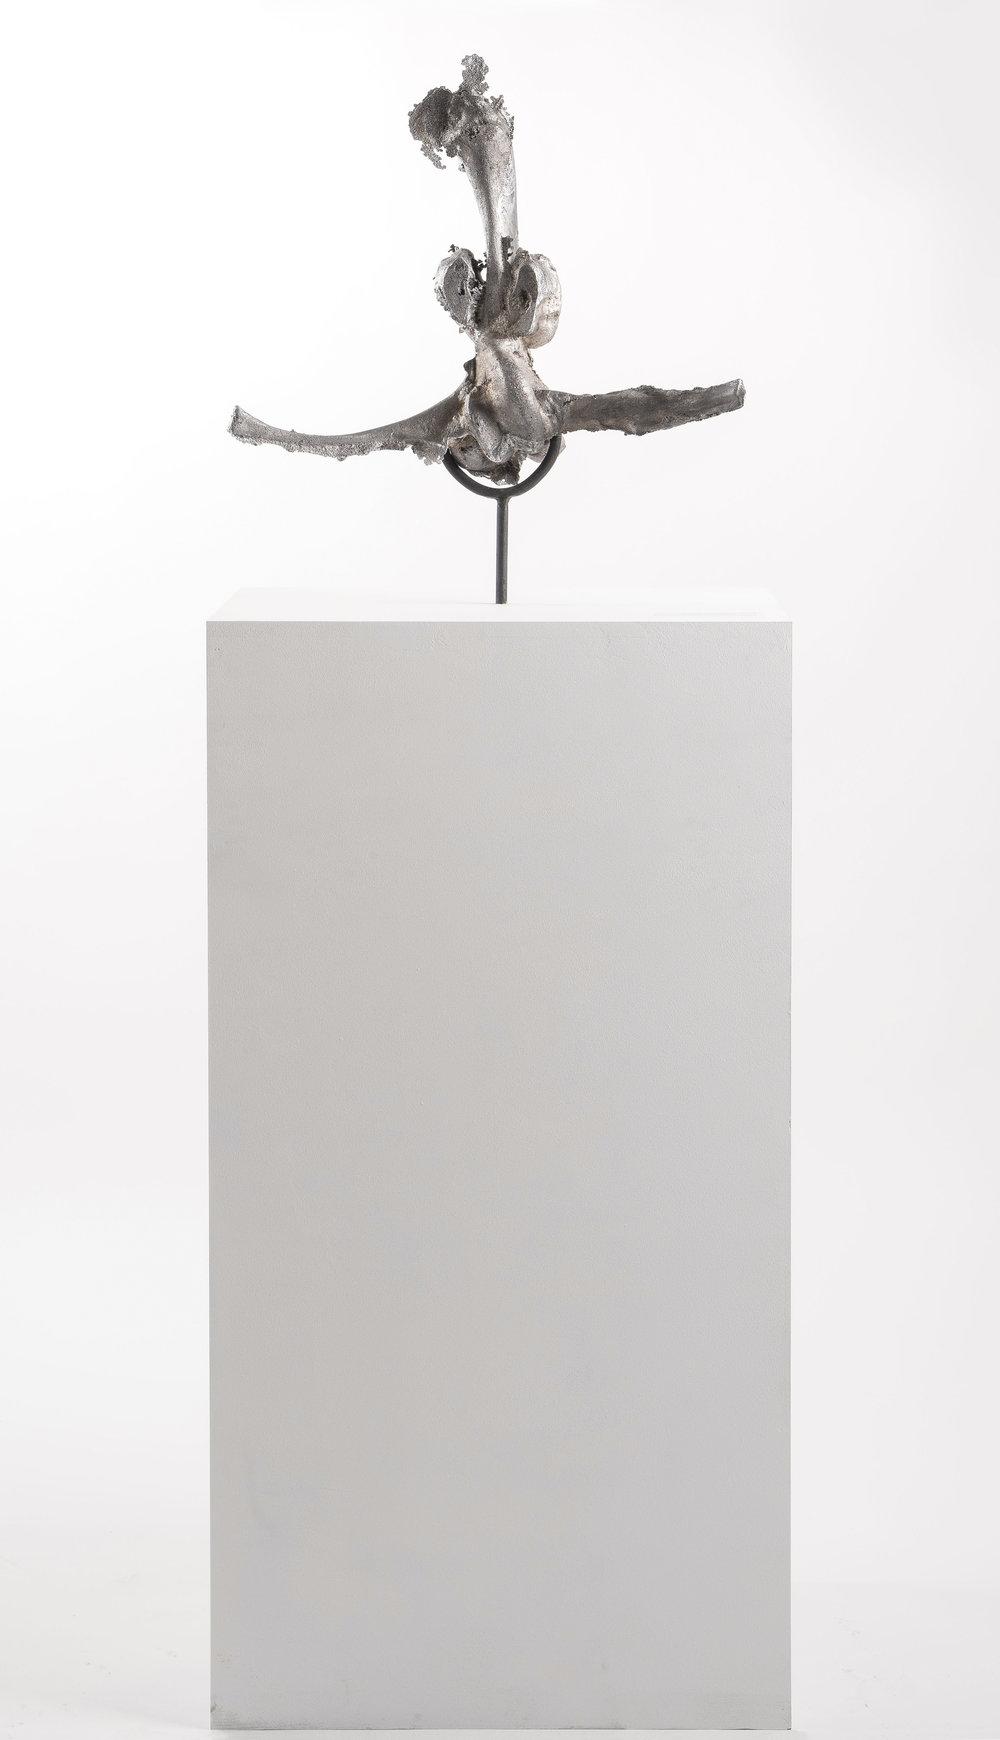 Untraceable Origin #58  , aluminum cast, wood, and steel,30cmx40cmx170 cm,2017